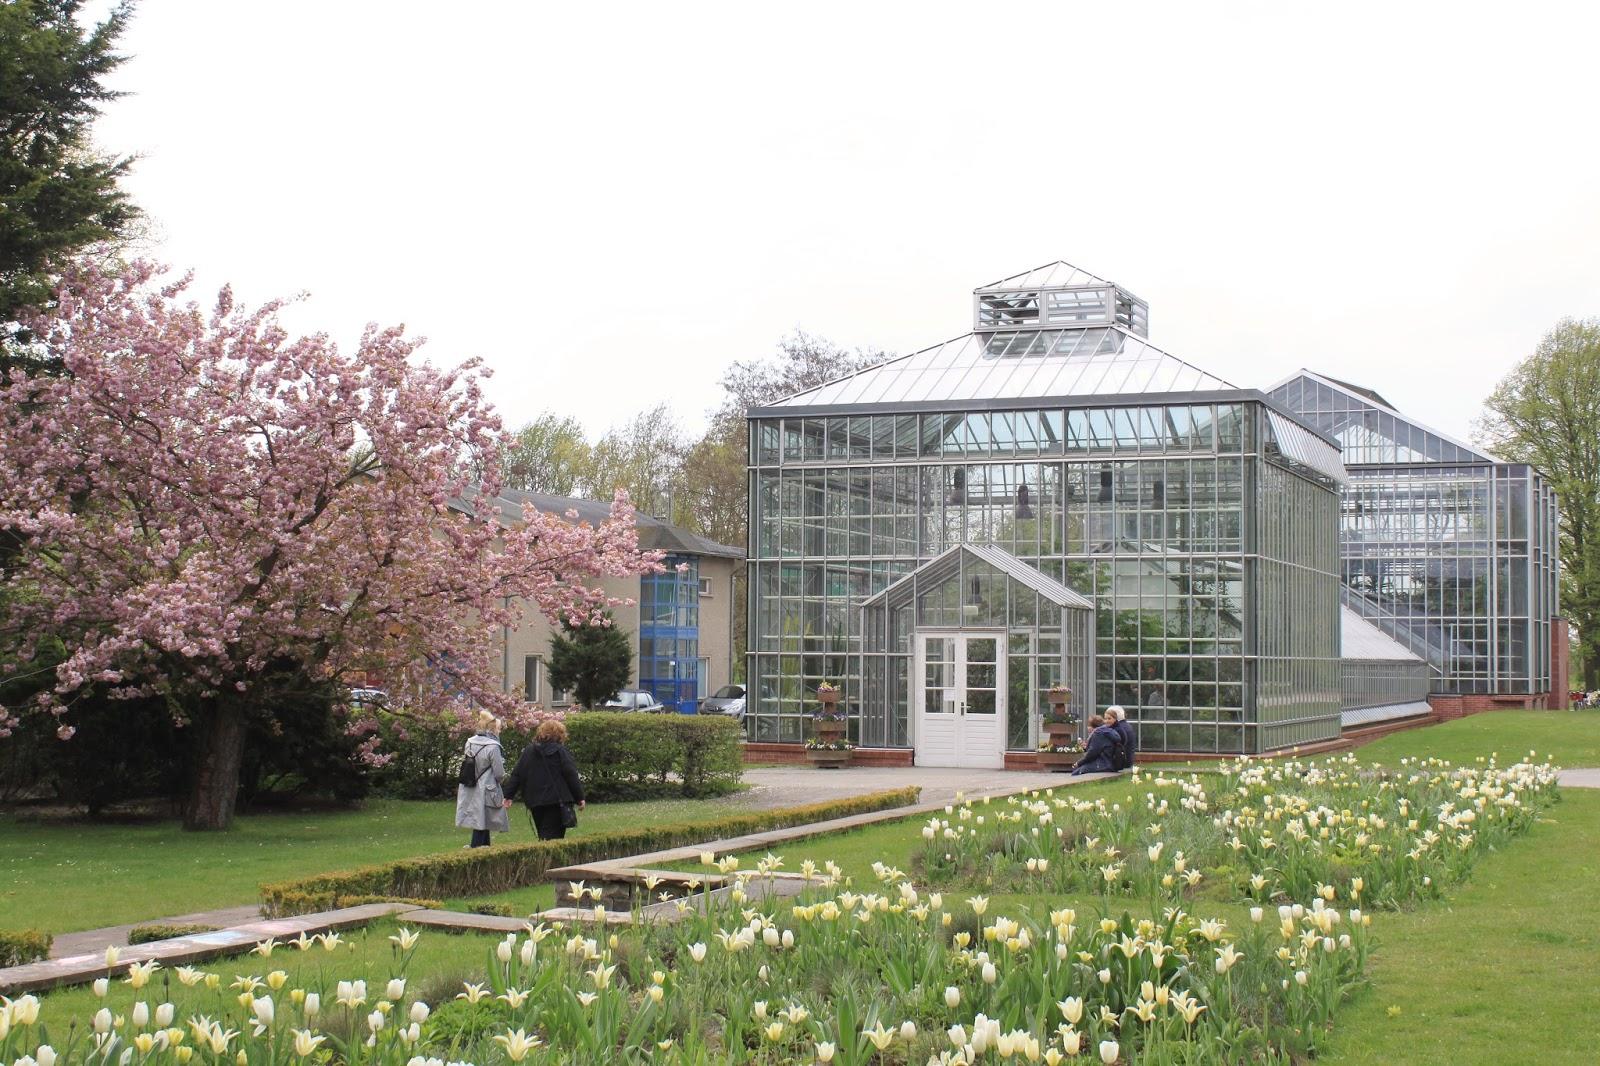 Ogród botaniczny Volkspark Pankow Blankenfelde